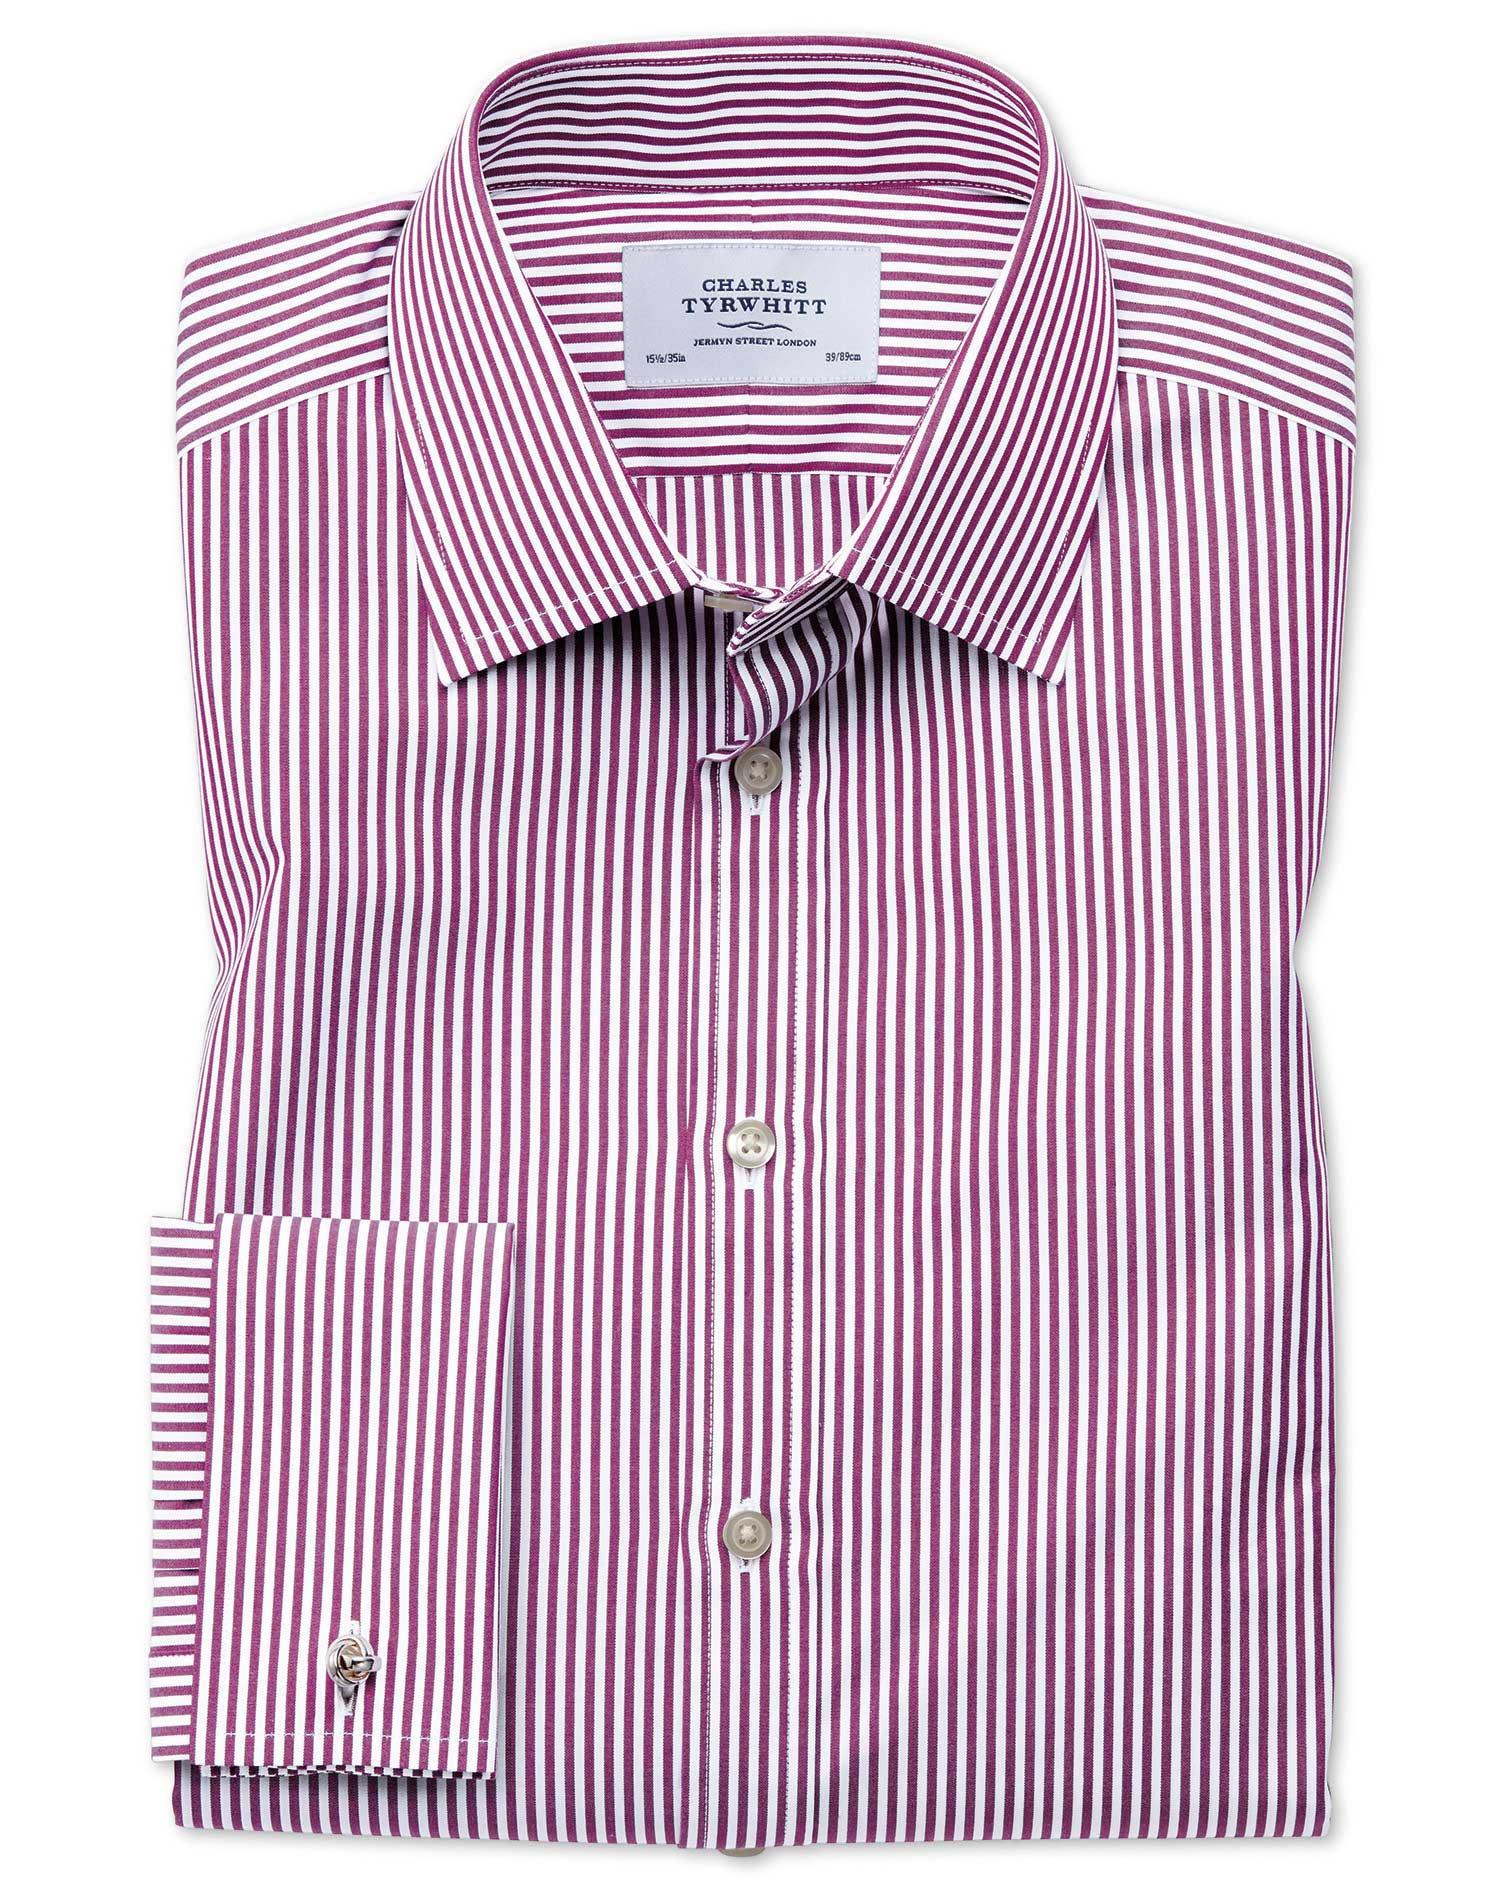 Slim Fit Bengal Stripe Purple Cotton Formal Shirt Single Cuff Size 16.5/34 by Charles Tyrwhitt